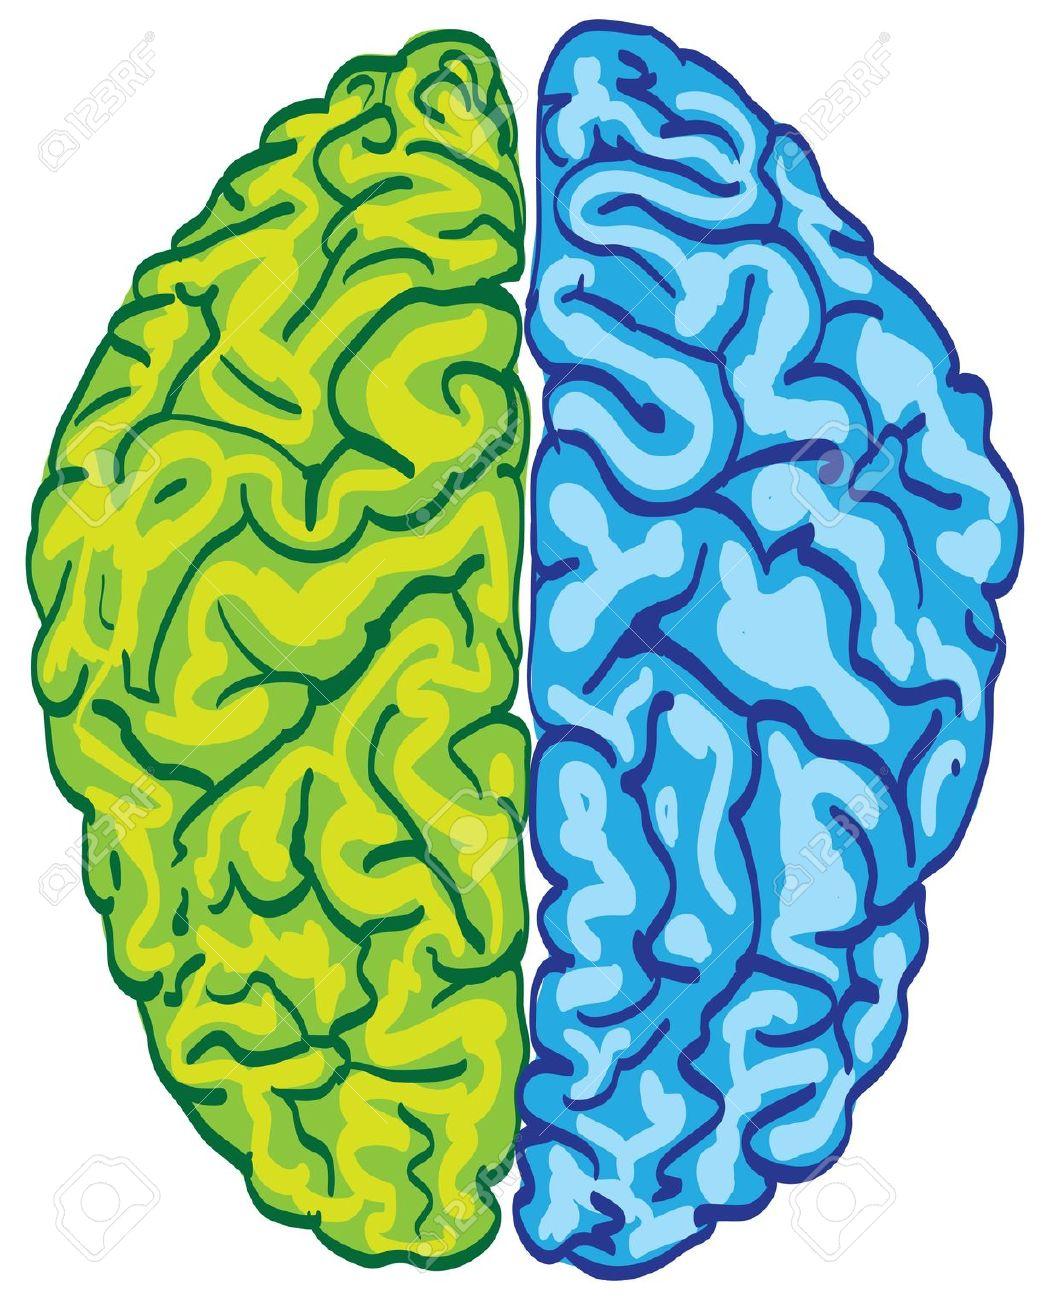 Color clipart brain Clipart com Brain 5 art